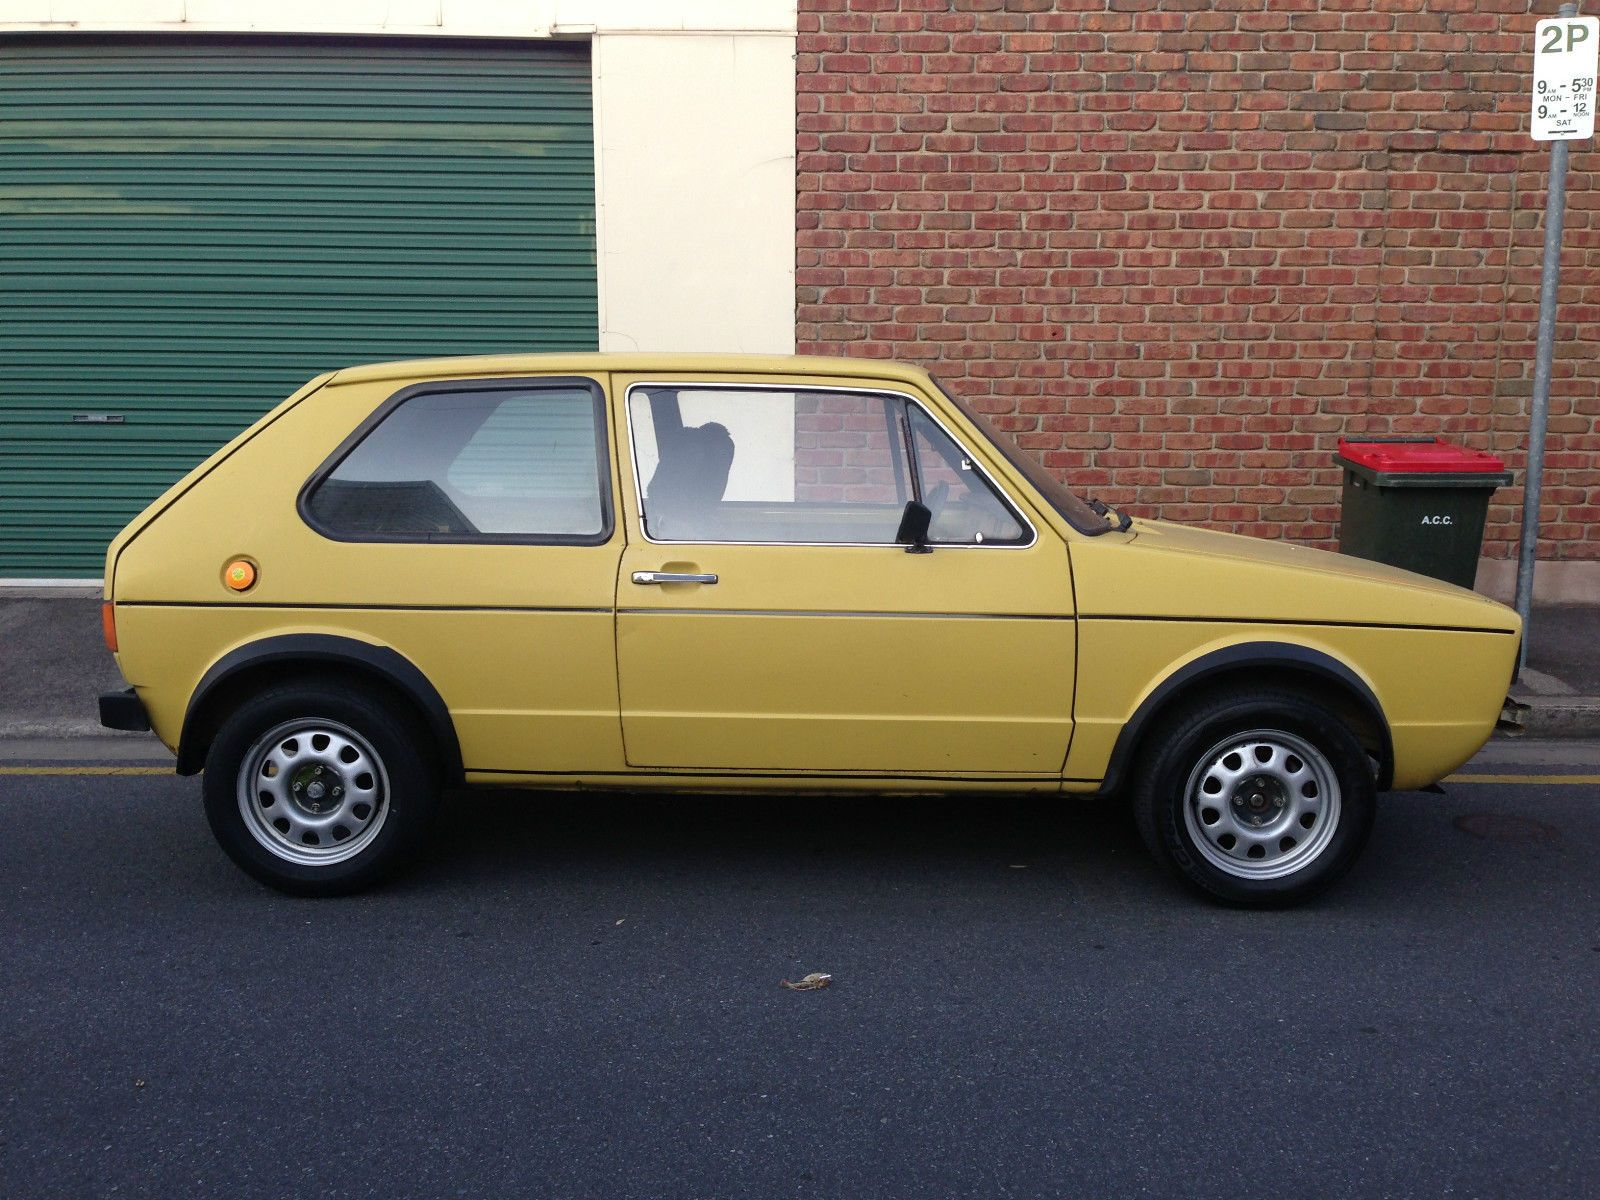 1976 VW Golf MK 1 Swallowtail Volkswagen in SA | eBay | Cars like ...